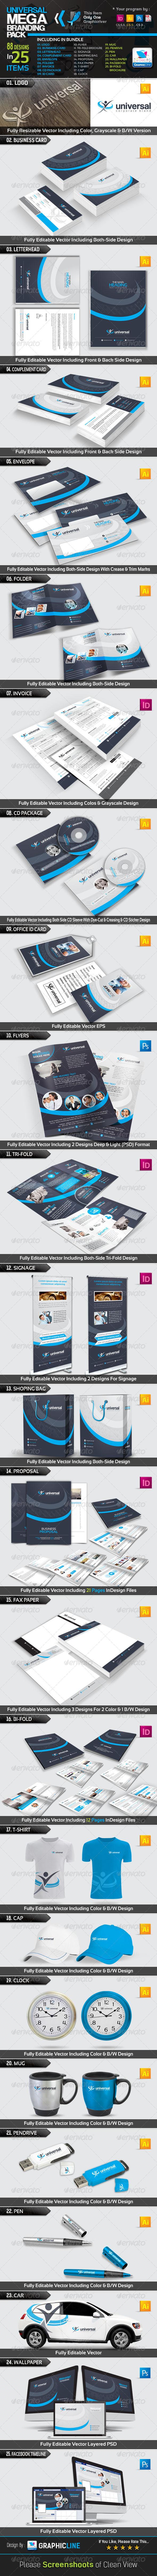 Universal_Mega Branding Pack - Stationery Print Templates